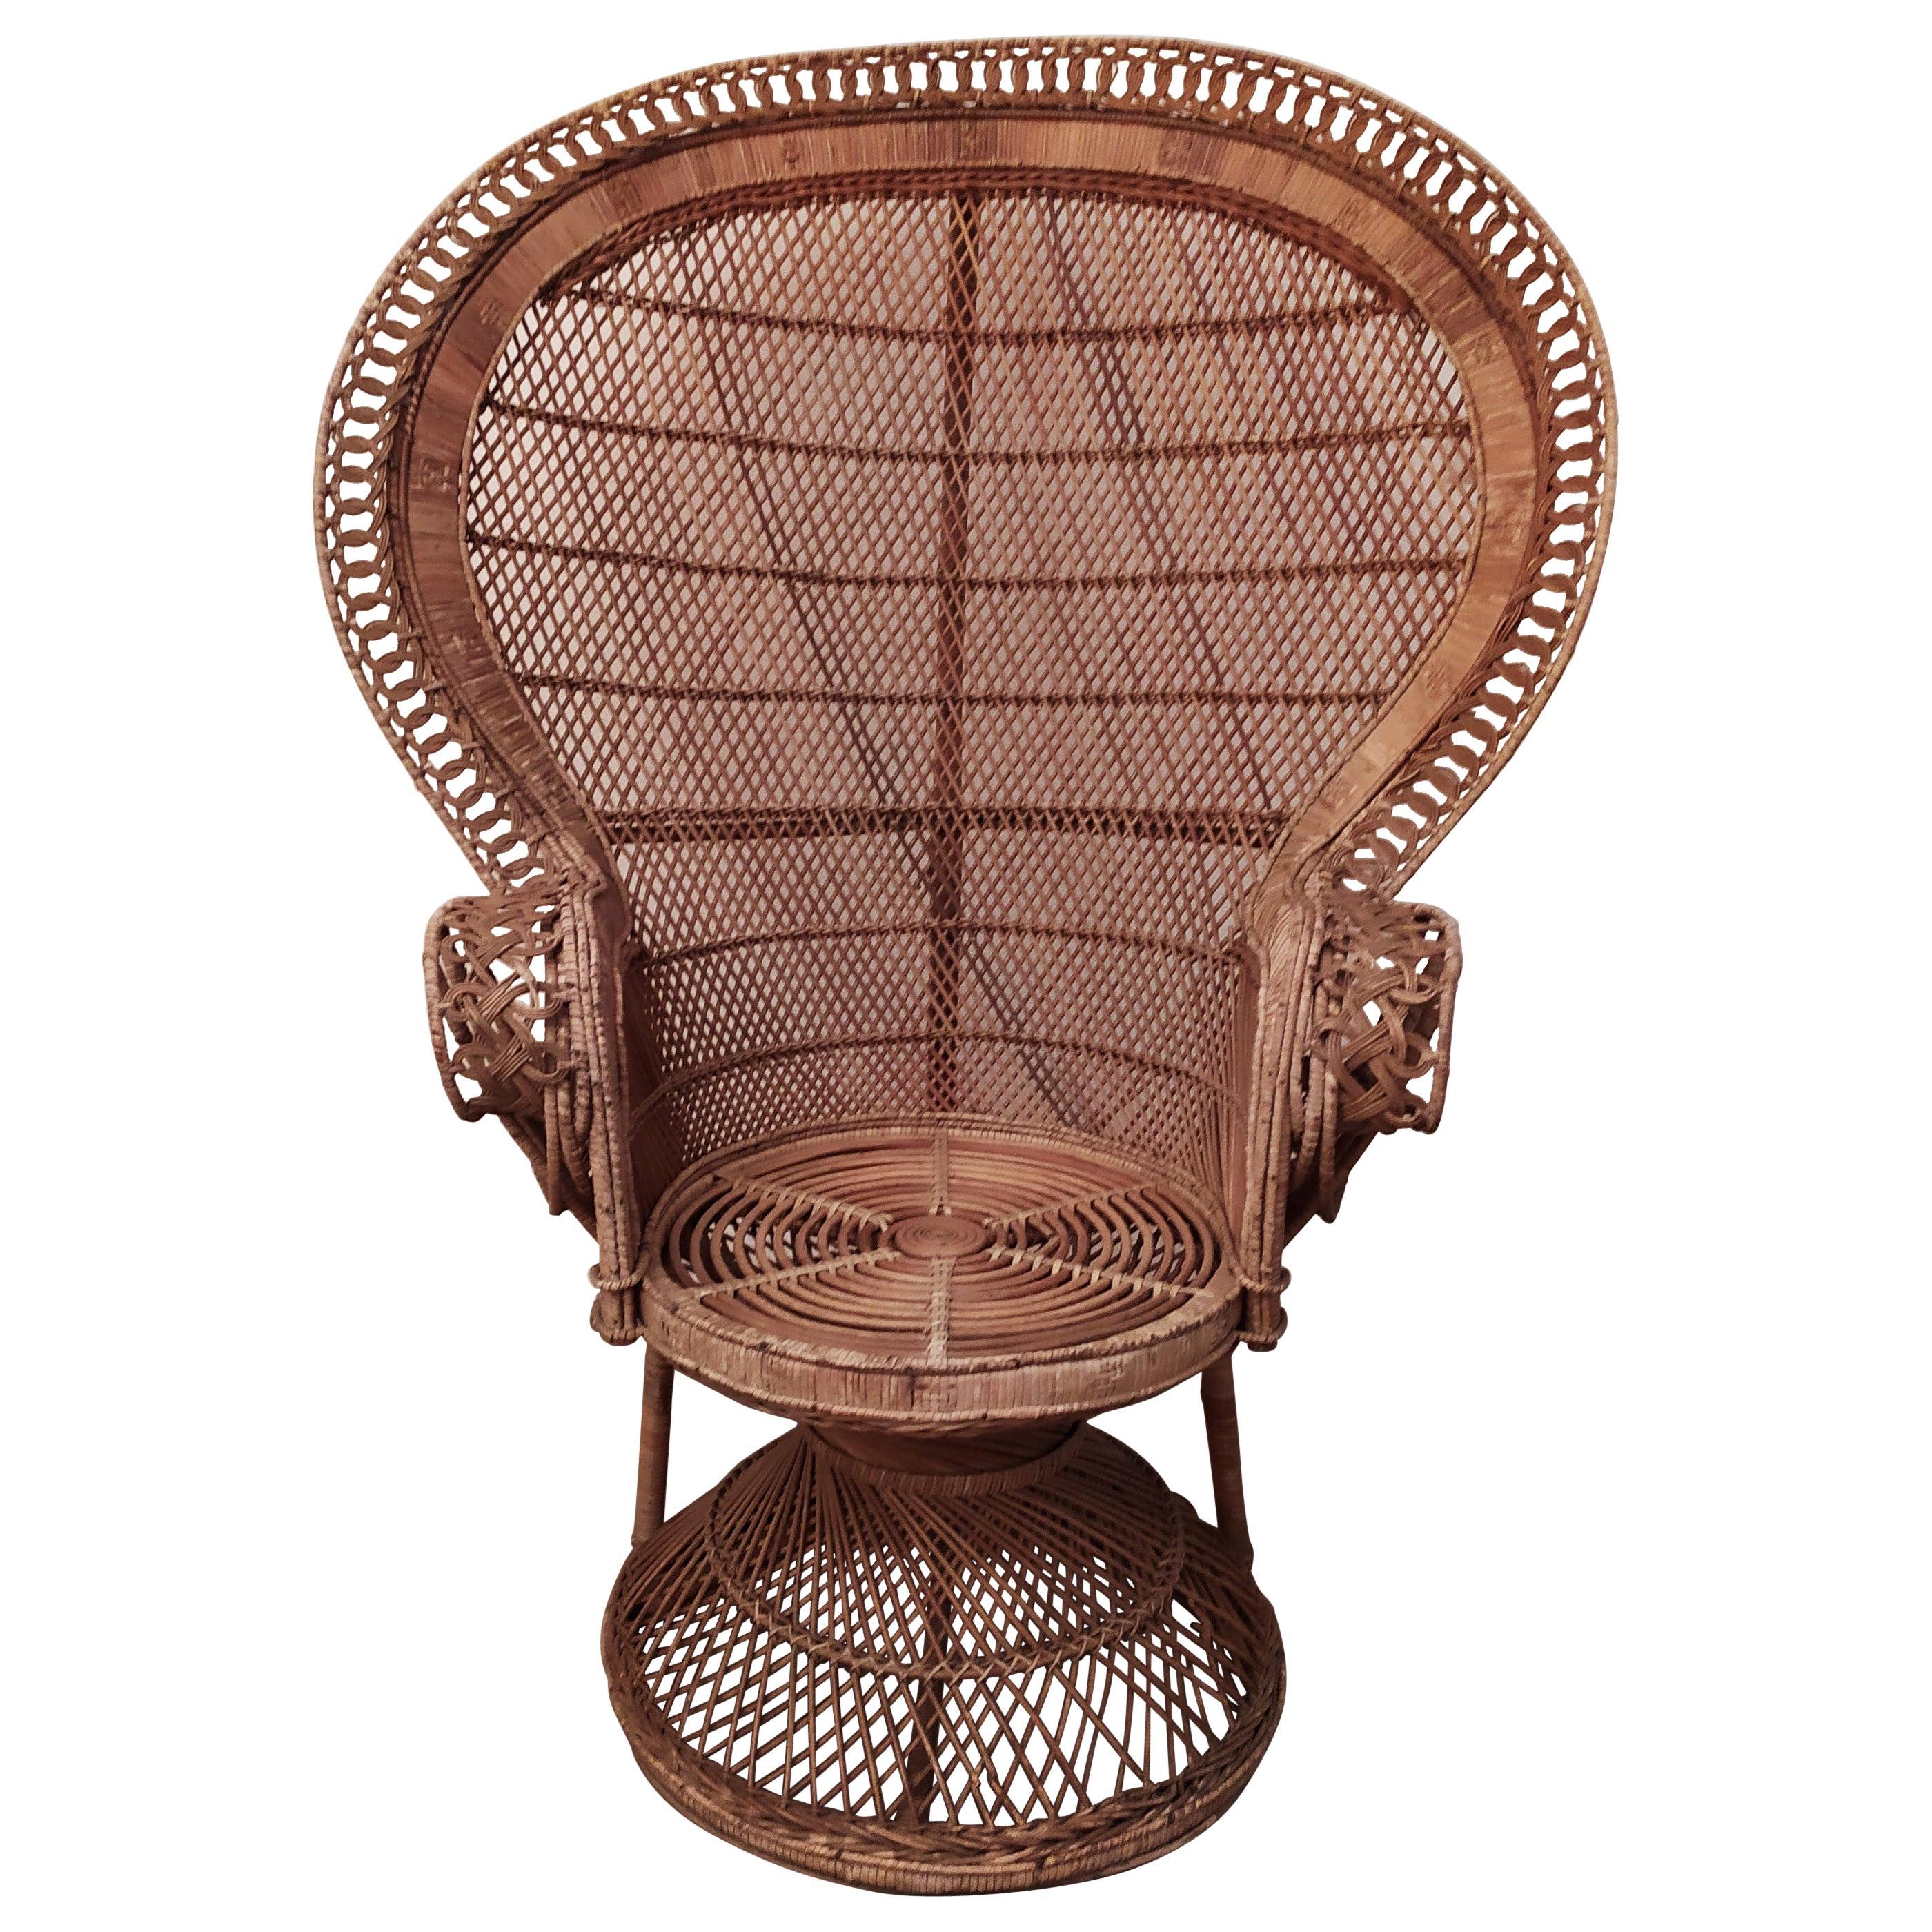 Mid Century Italian Peacock Armchair in Wicker